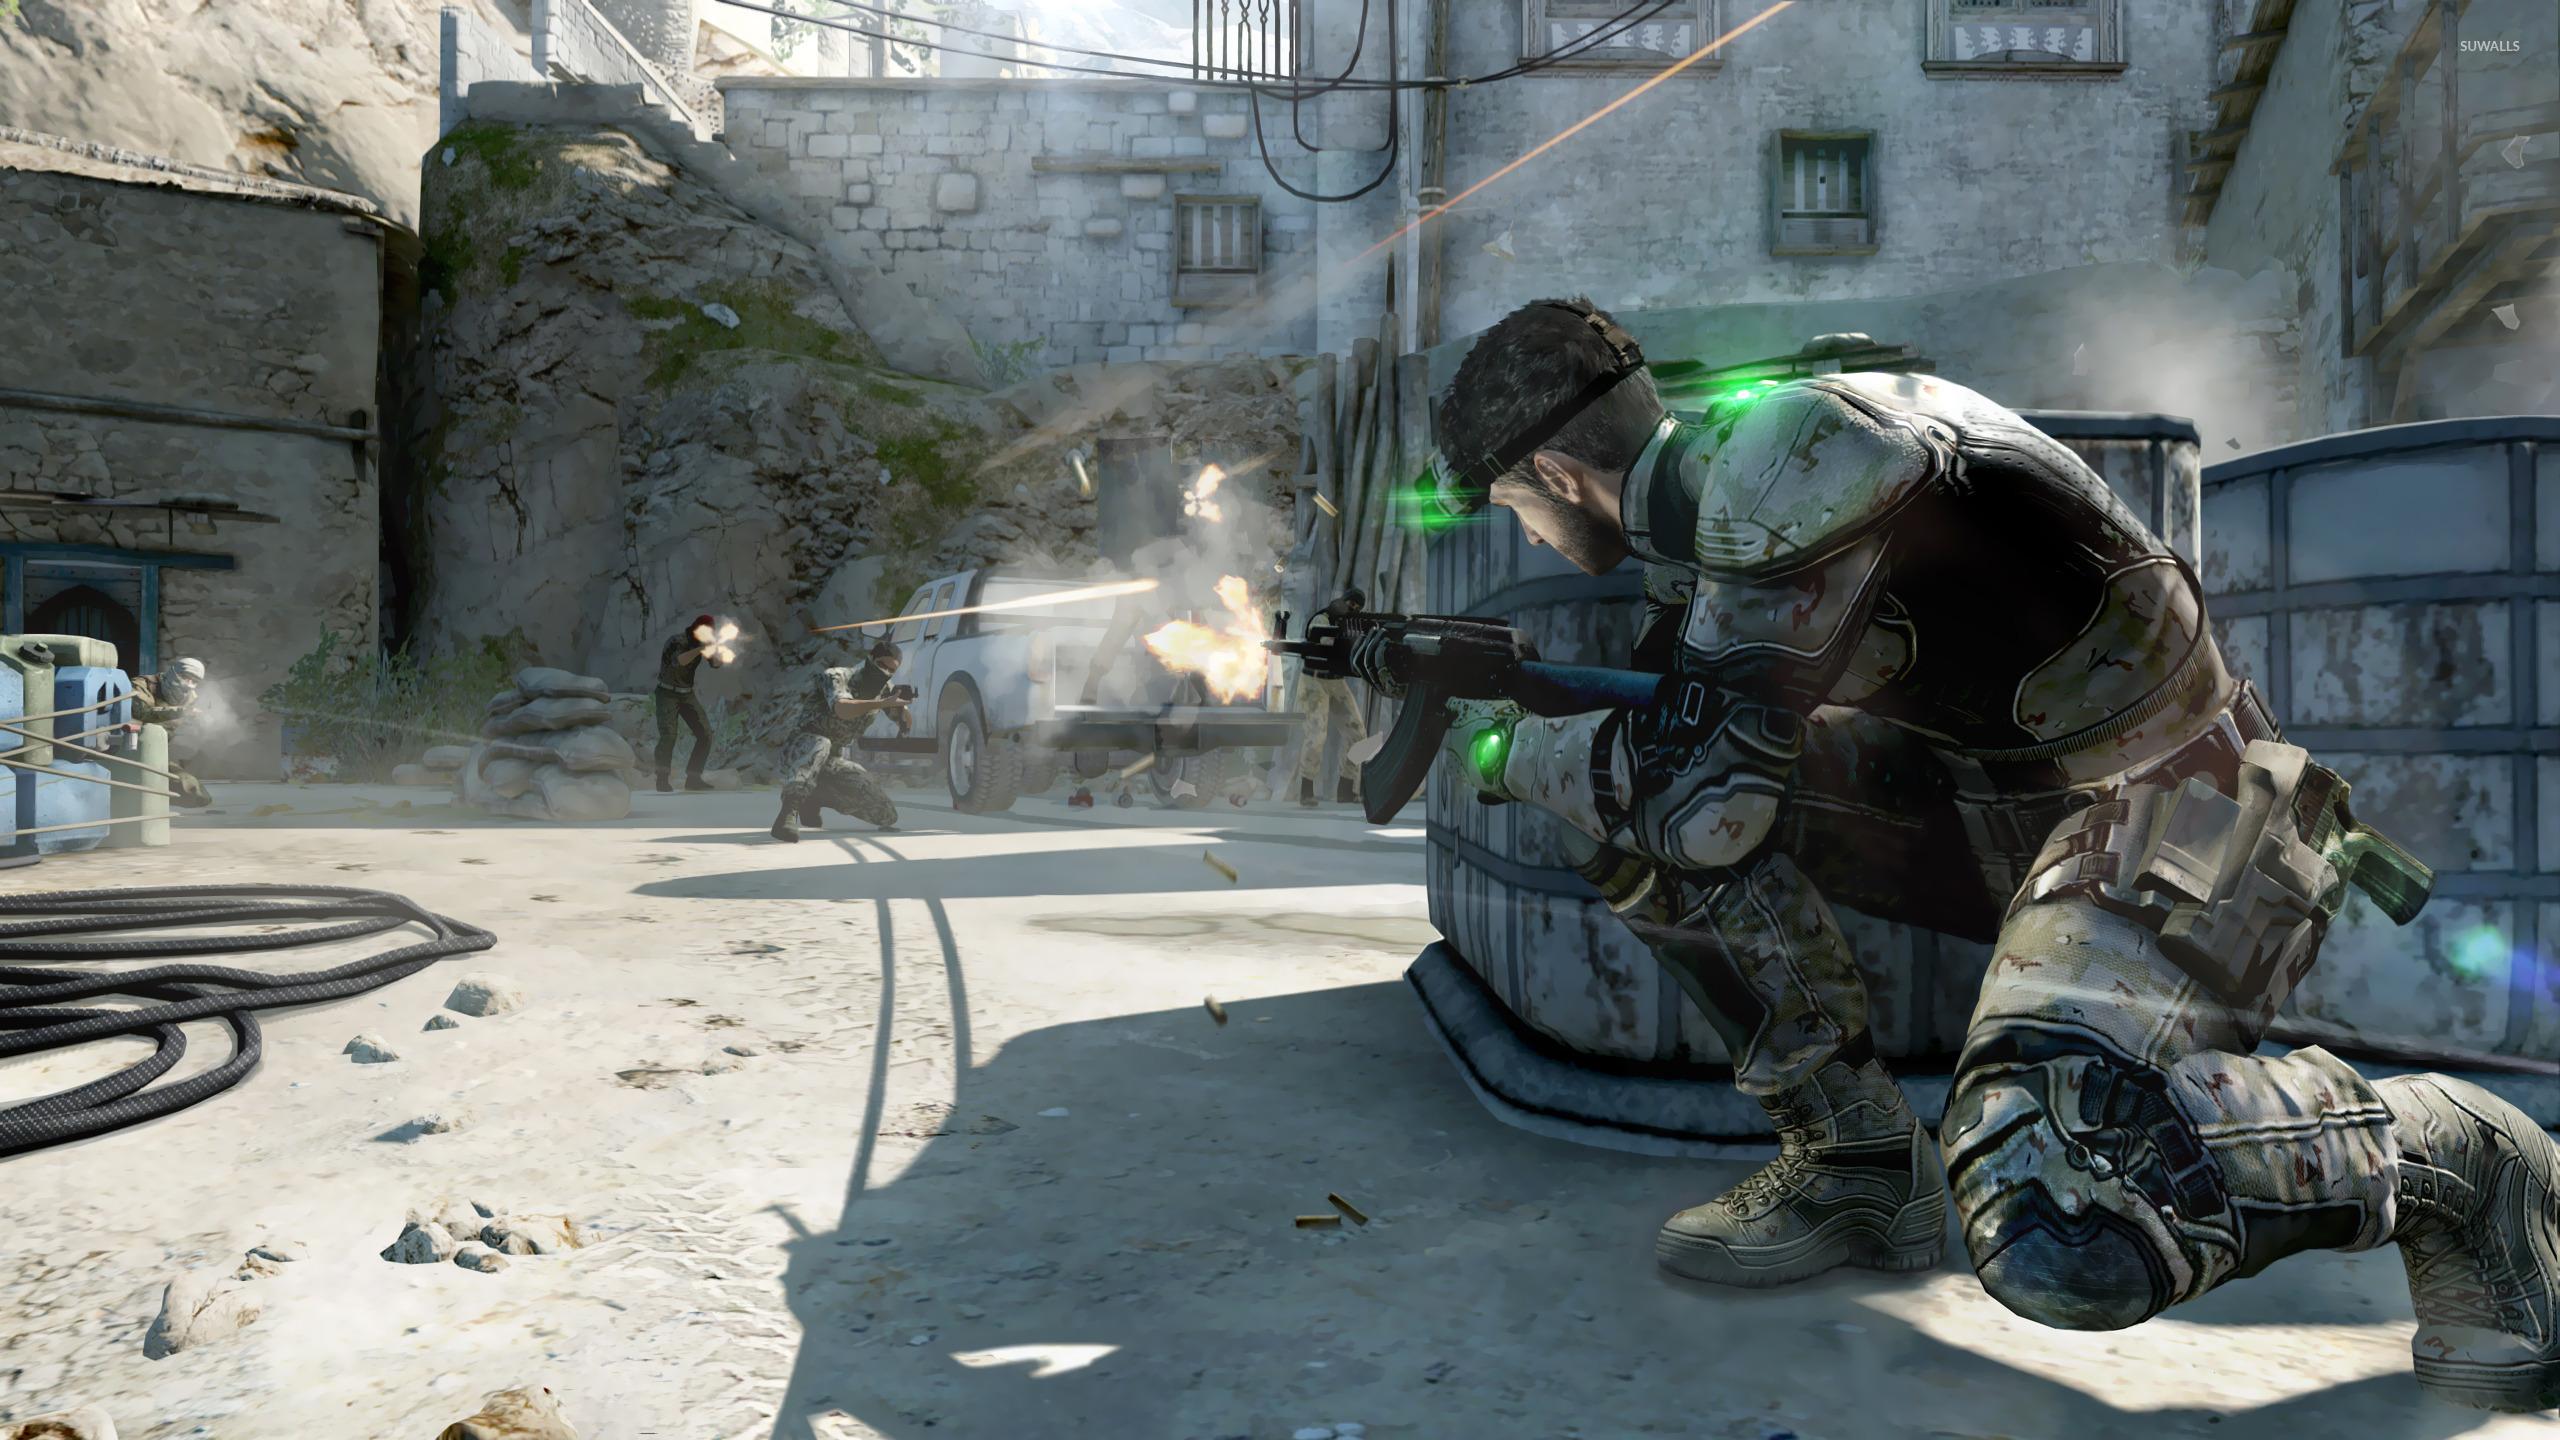 Скриншот  3 - Tom Clancy Splinter Cell Blacklist (Uplay key)